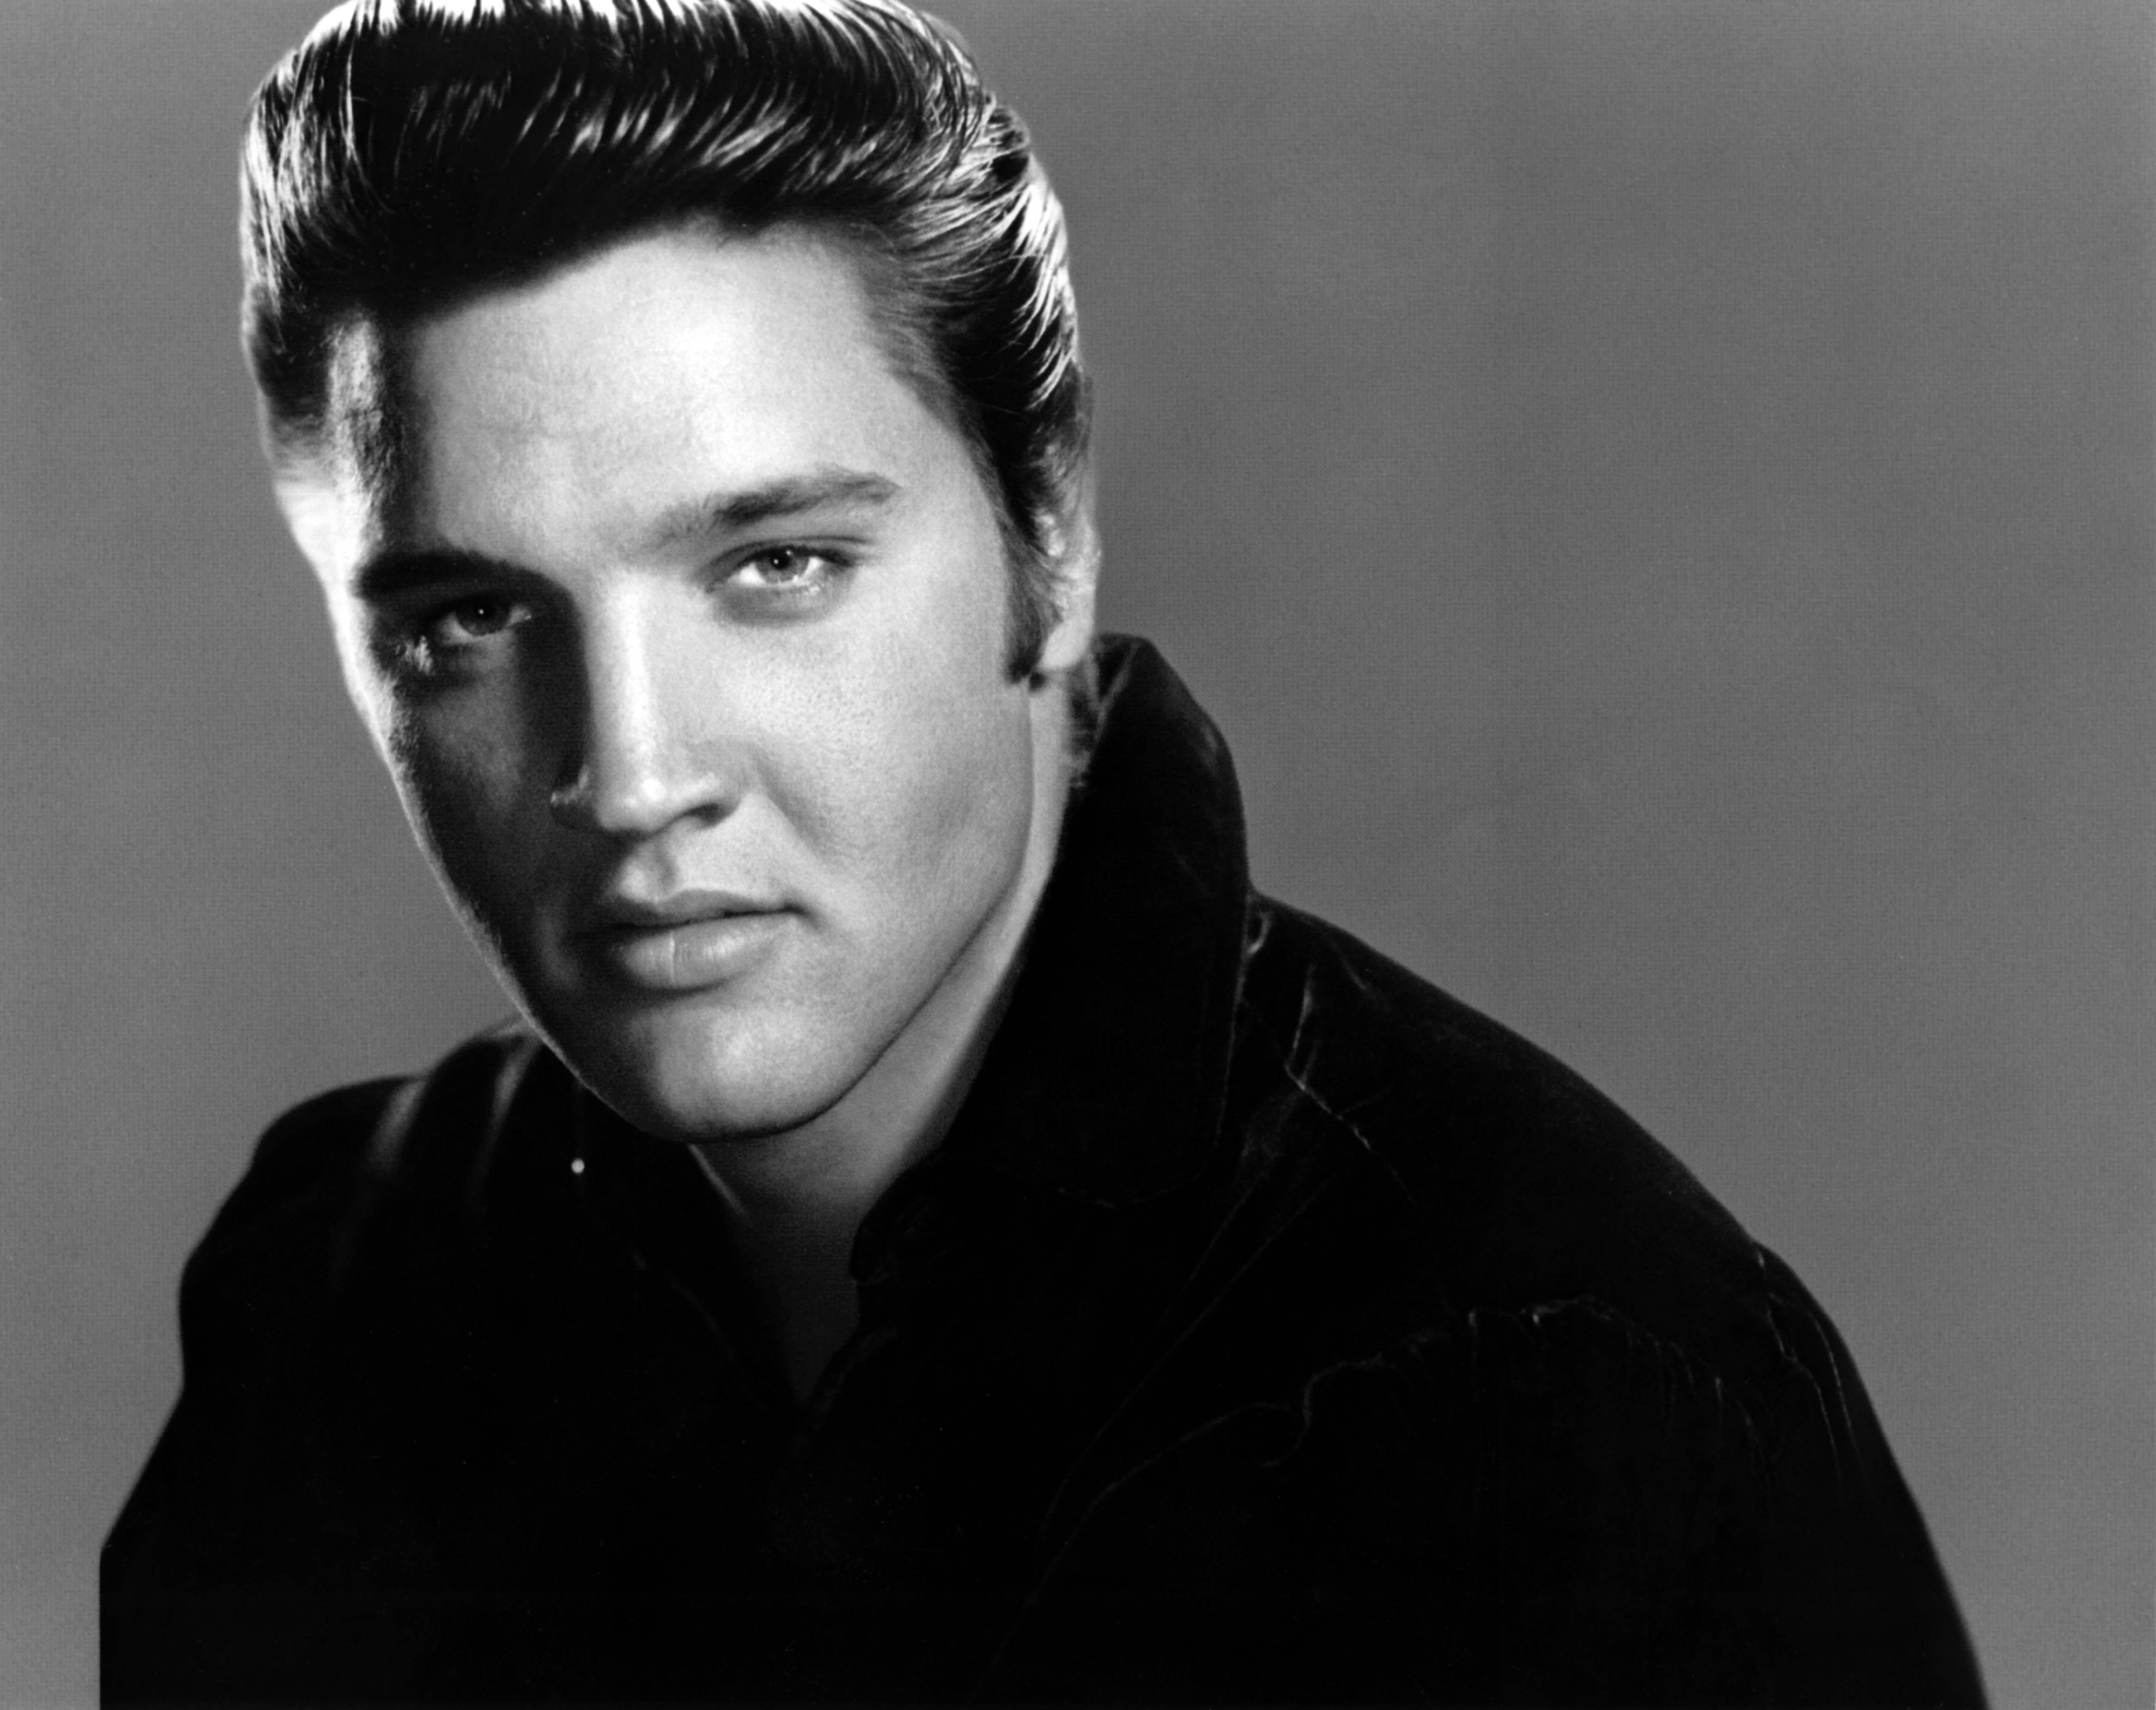 Inside the Enduring Mysteries of Elvis Presley's Death